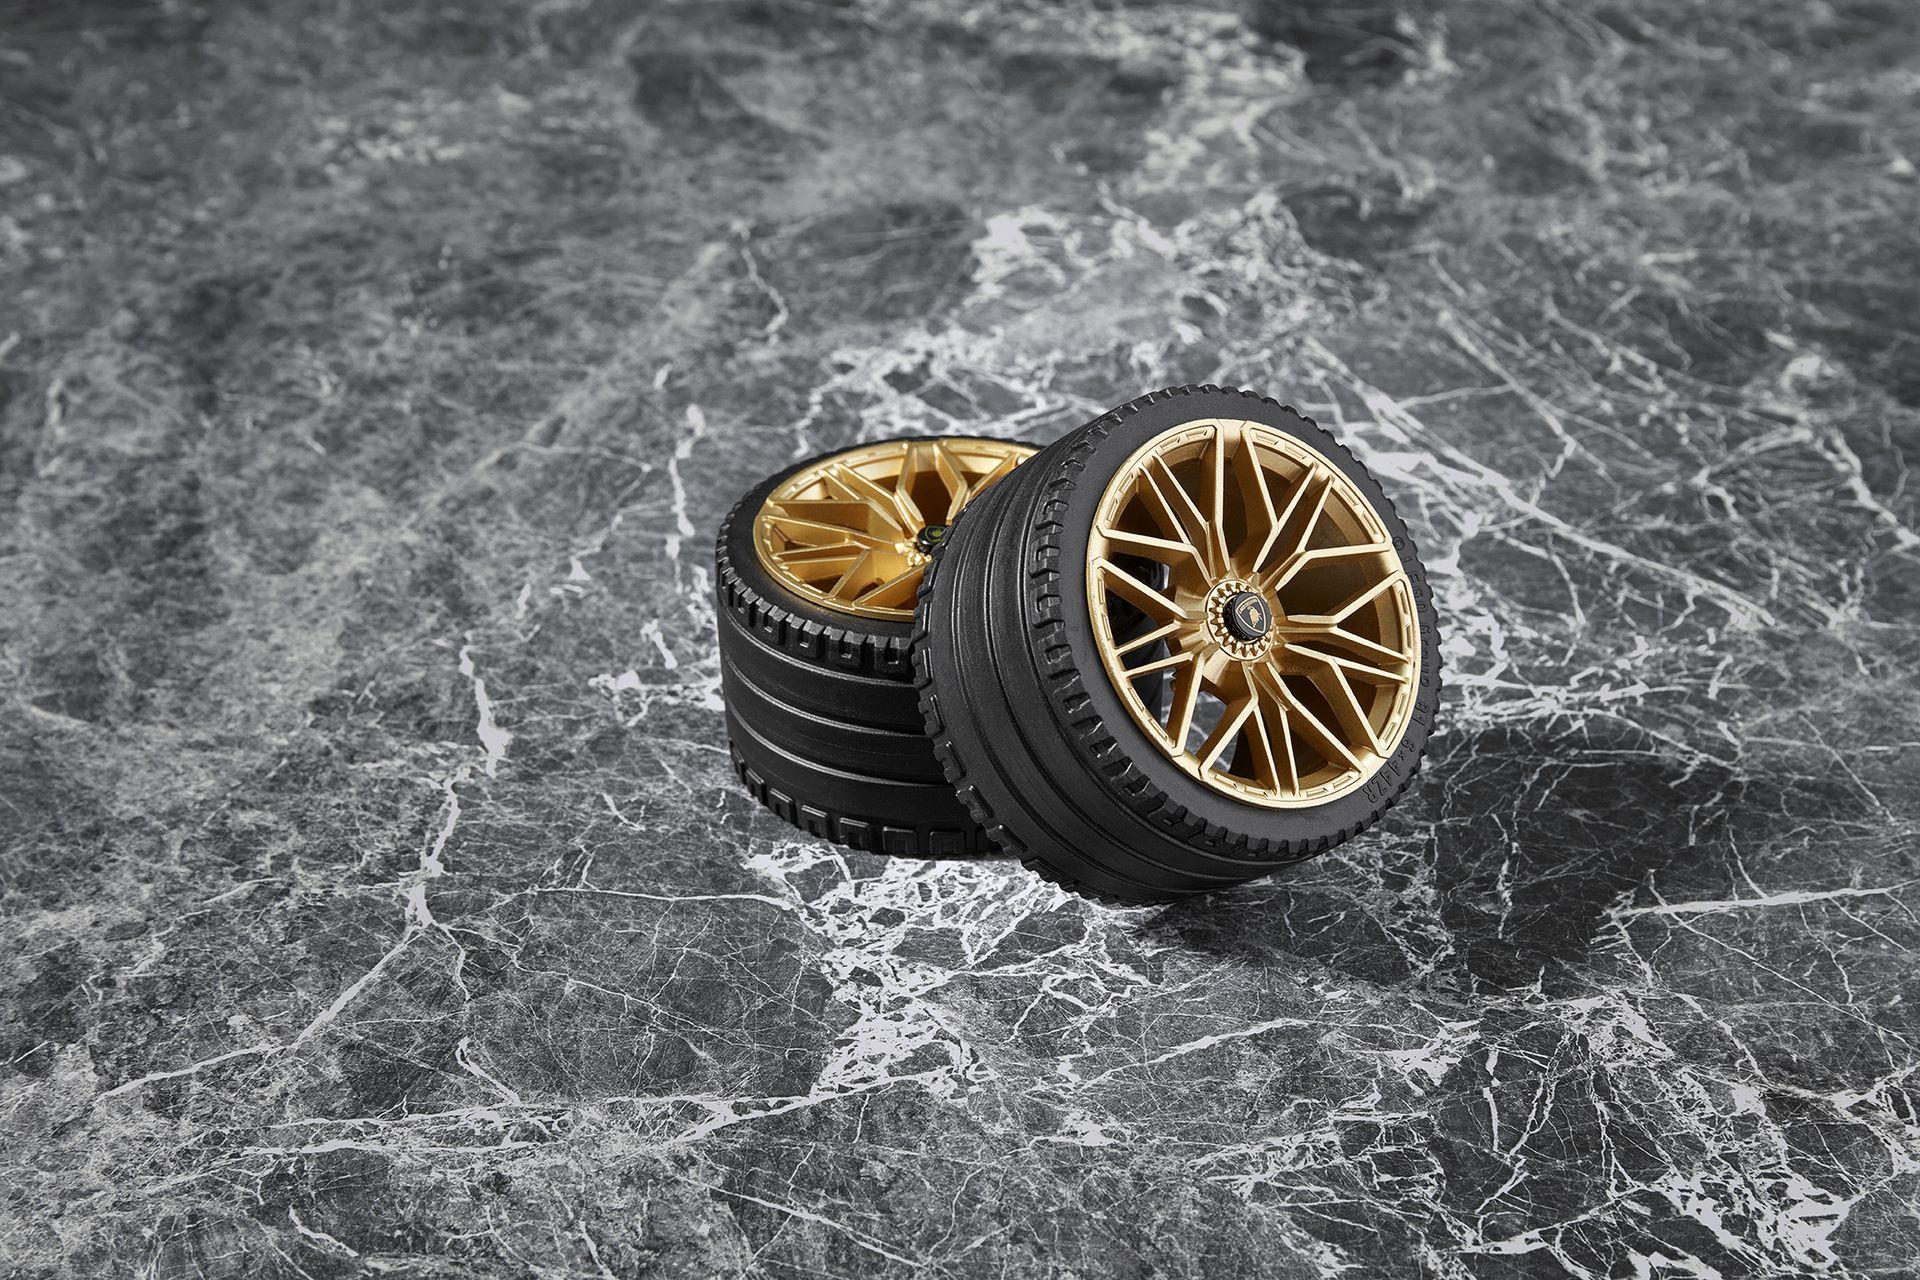 Lamborghini-Sian-FKP-37-Lego-Technic-5